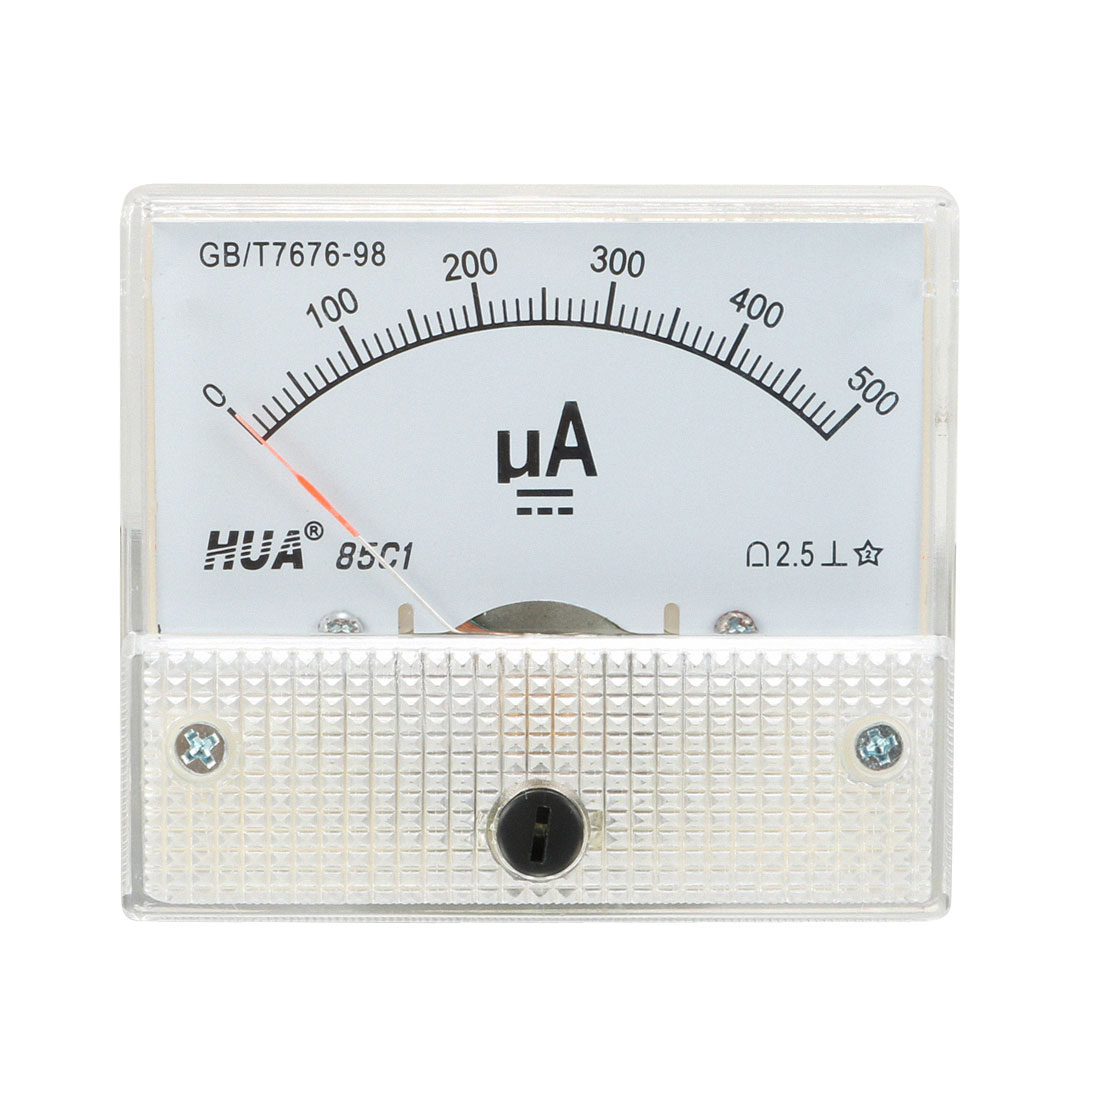 DC 0-500uA Rectangle Panel Analog Meter Ammeter 85C1-uA